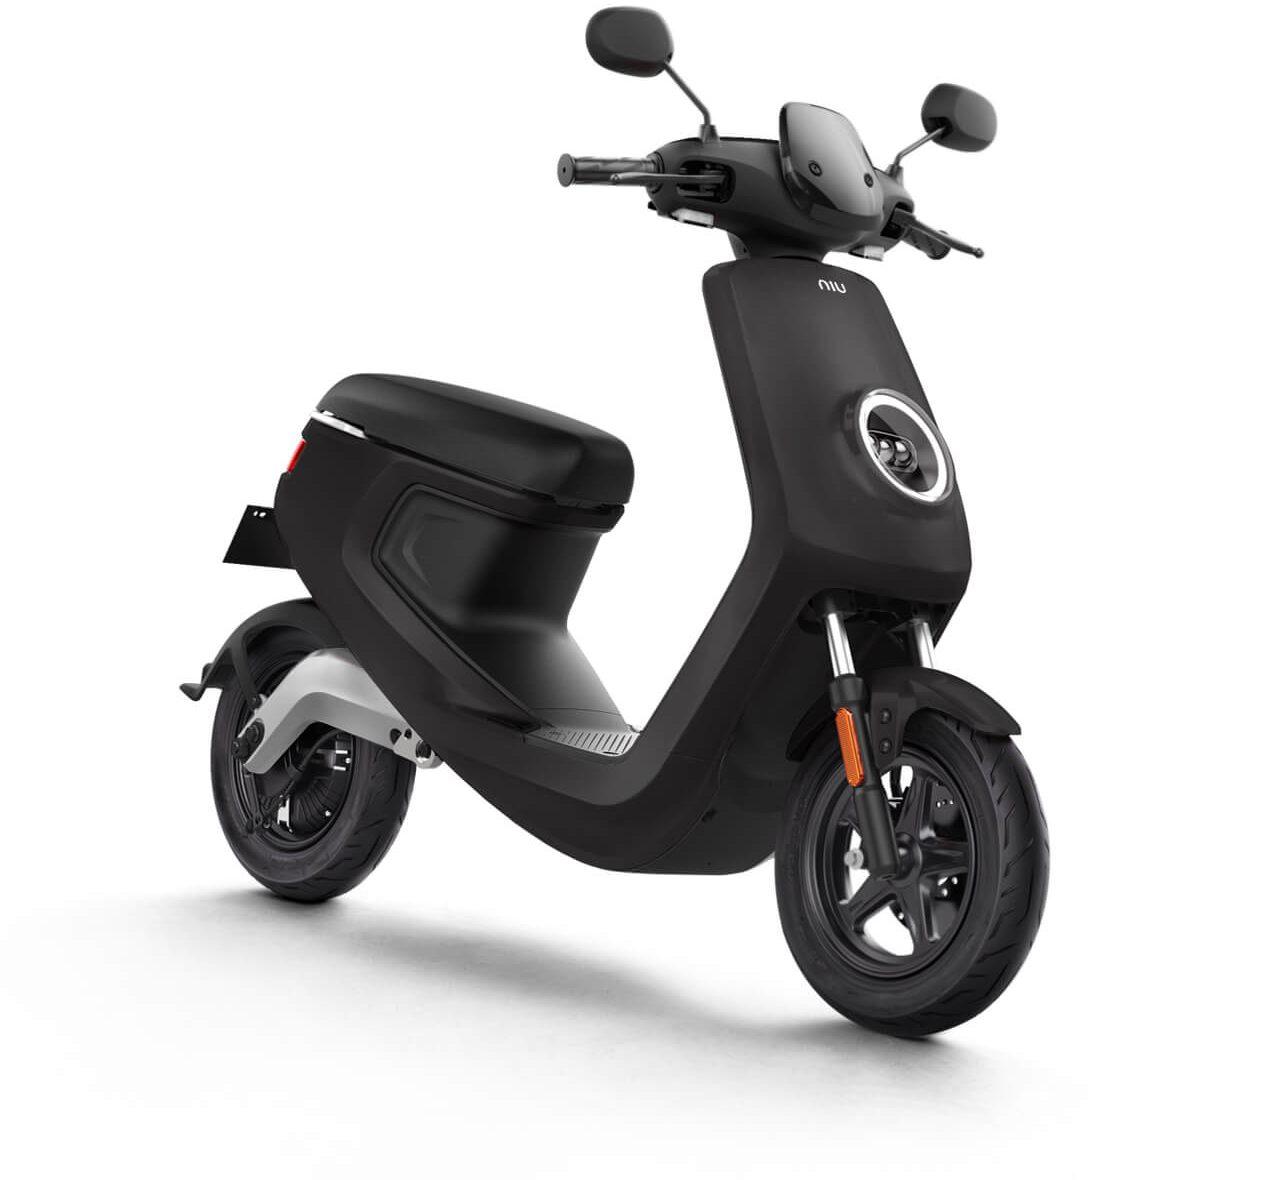 Motocicleta electrica Niu M1 PRO